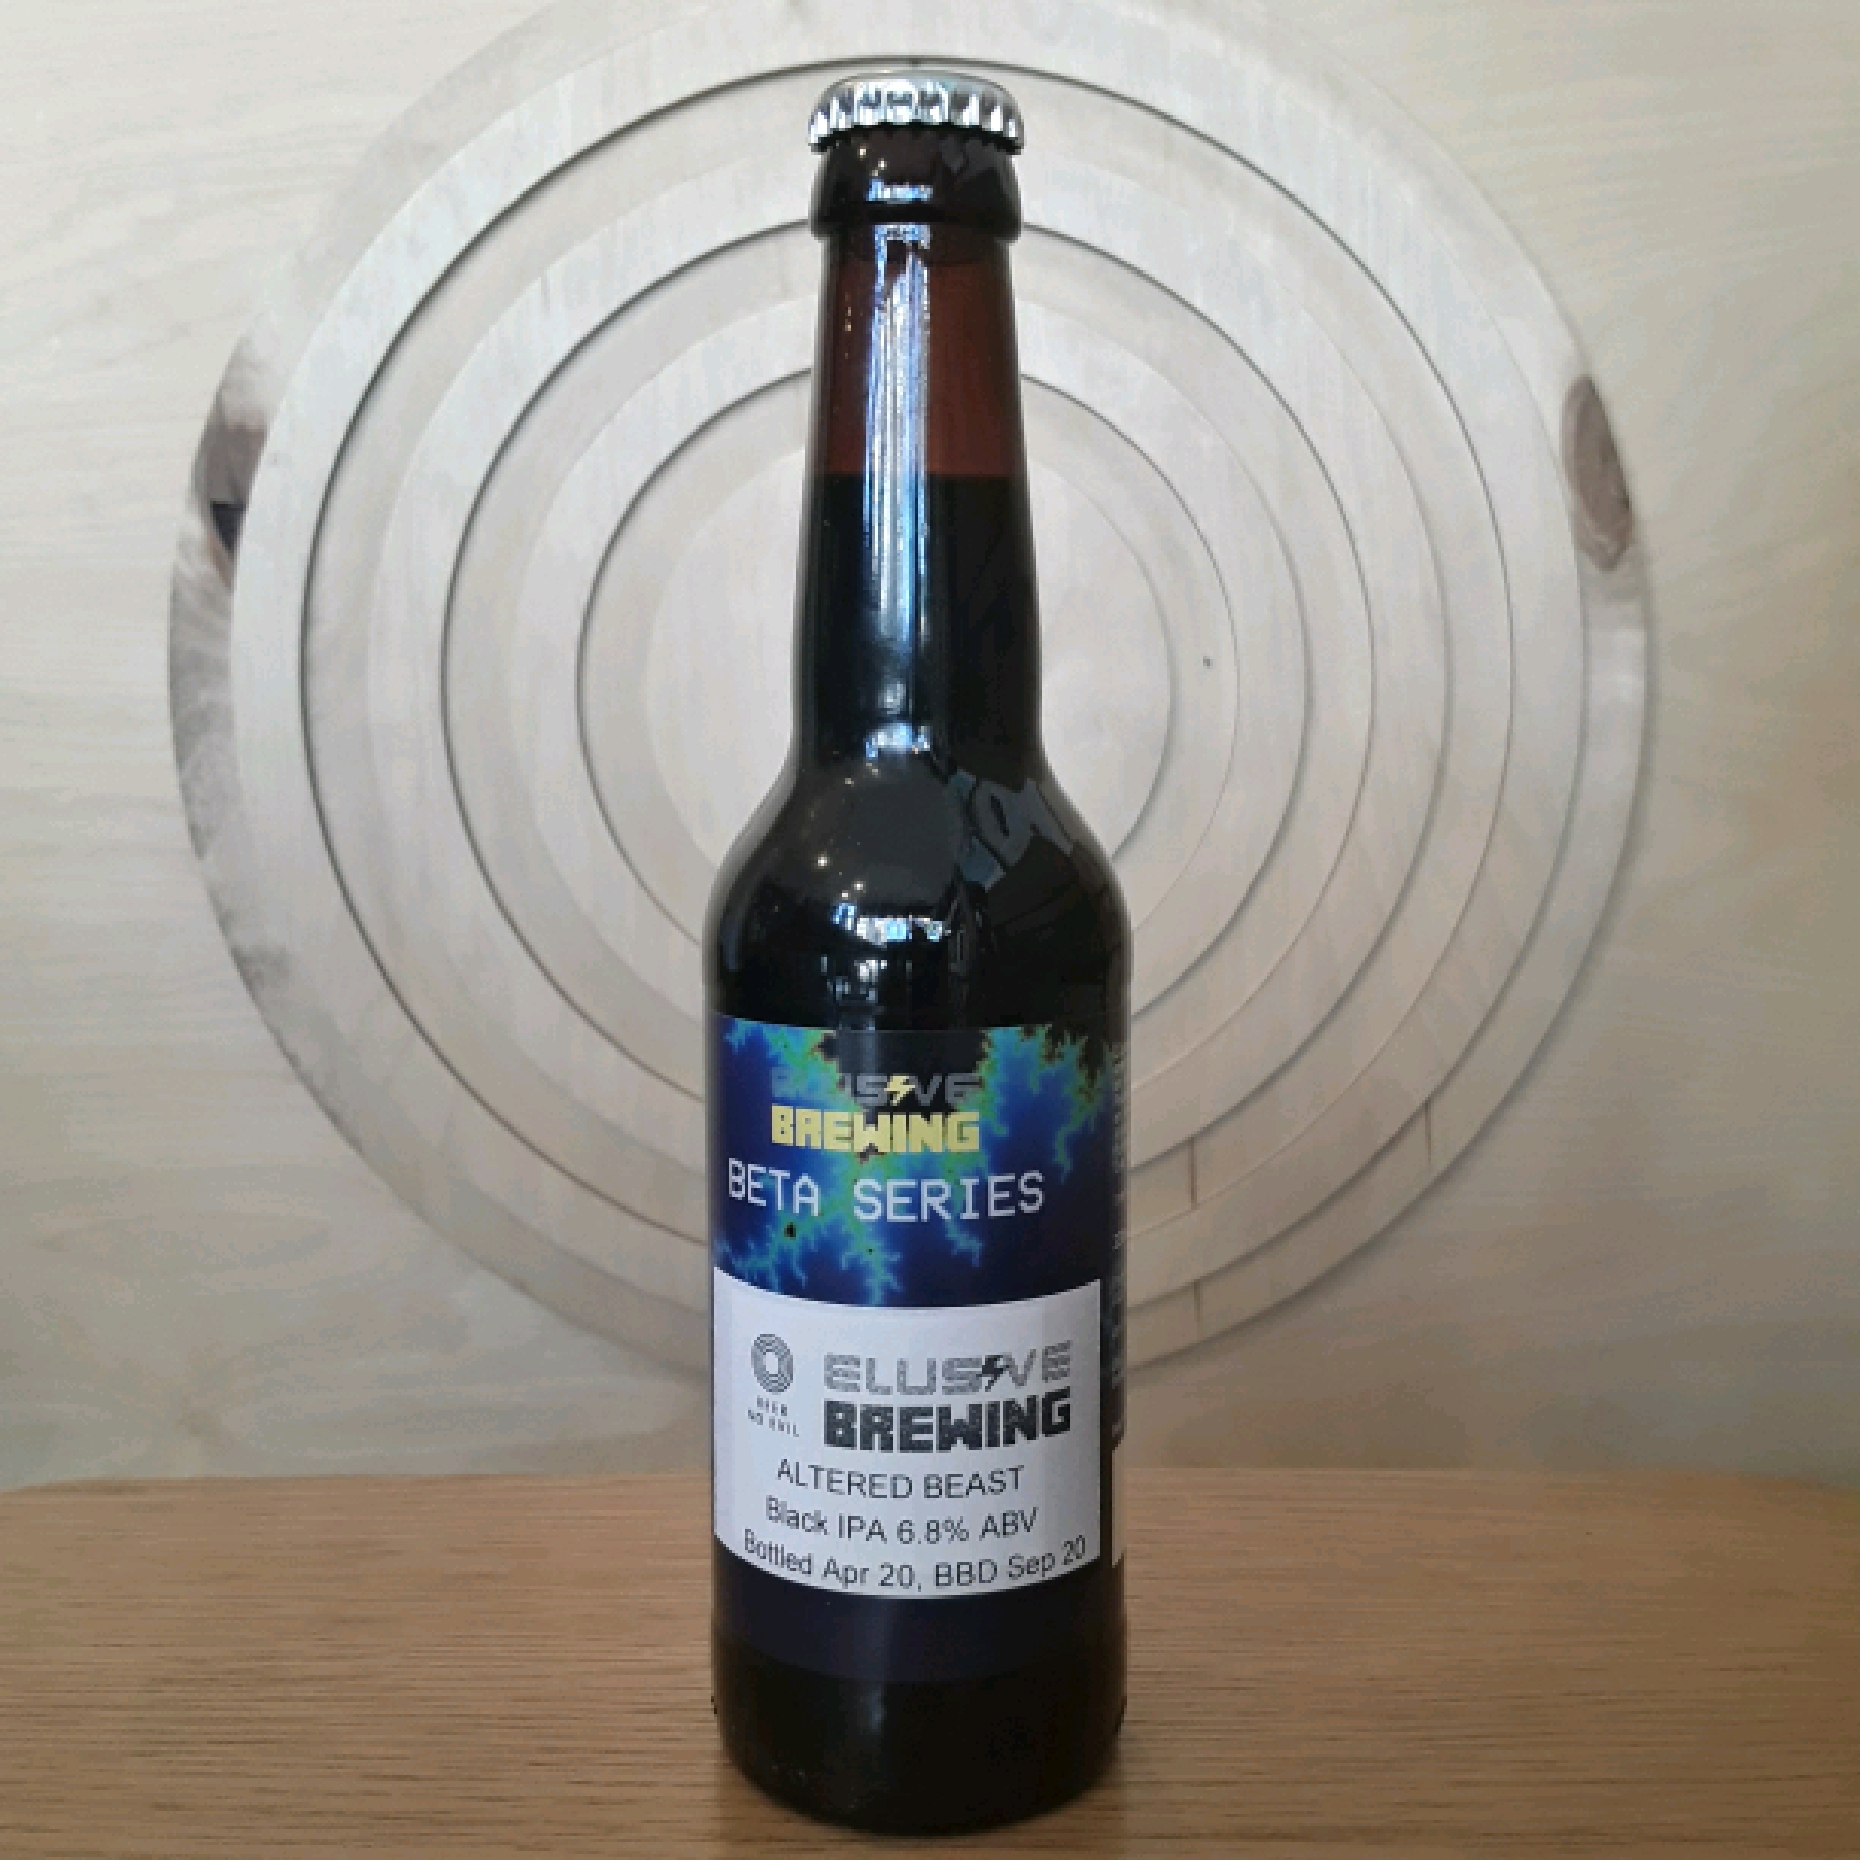 Elusive Brewing x Beer No Evil Altered Beast BIPA